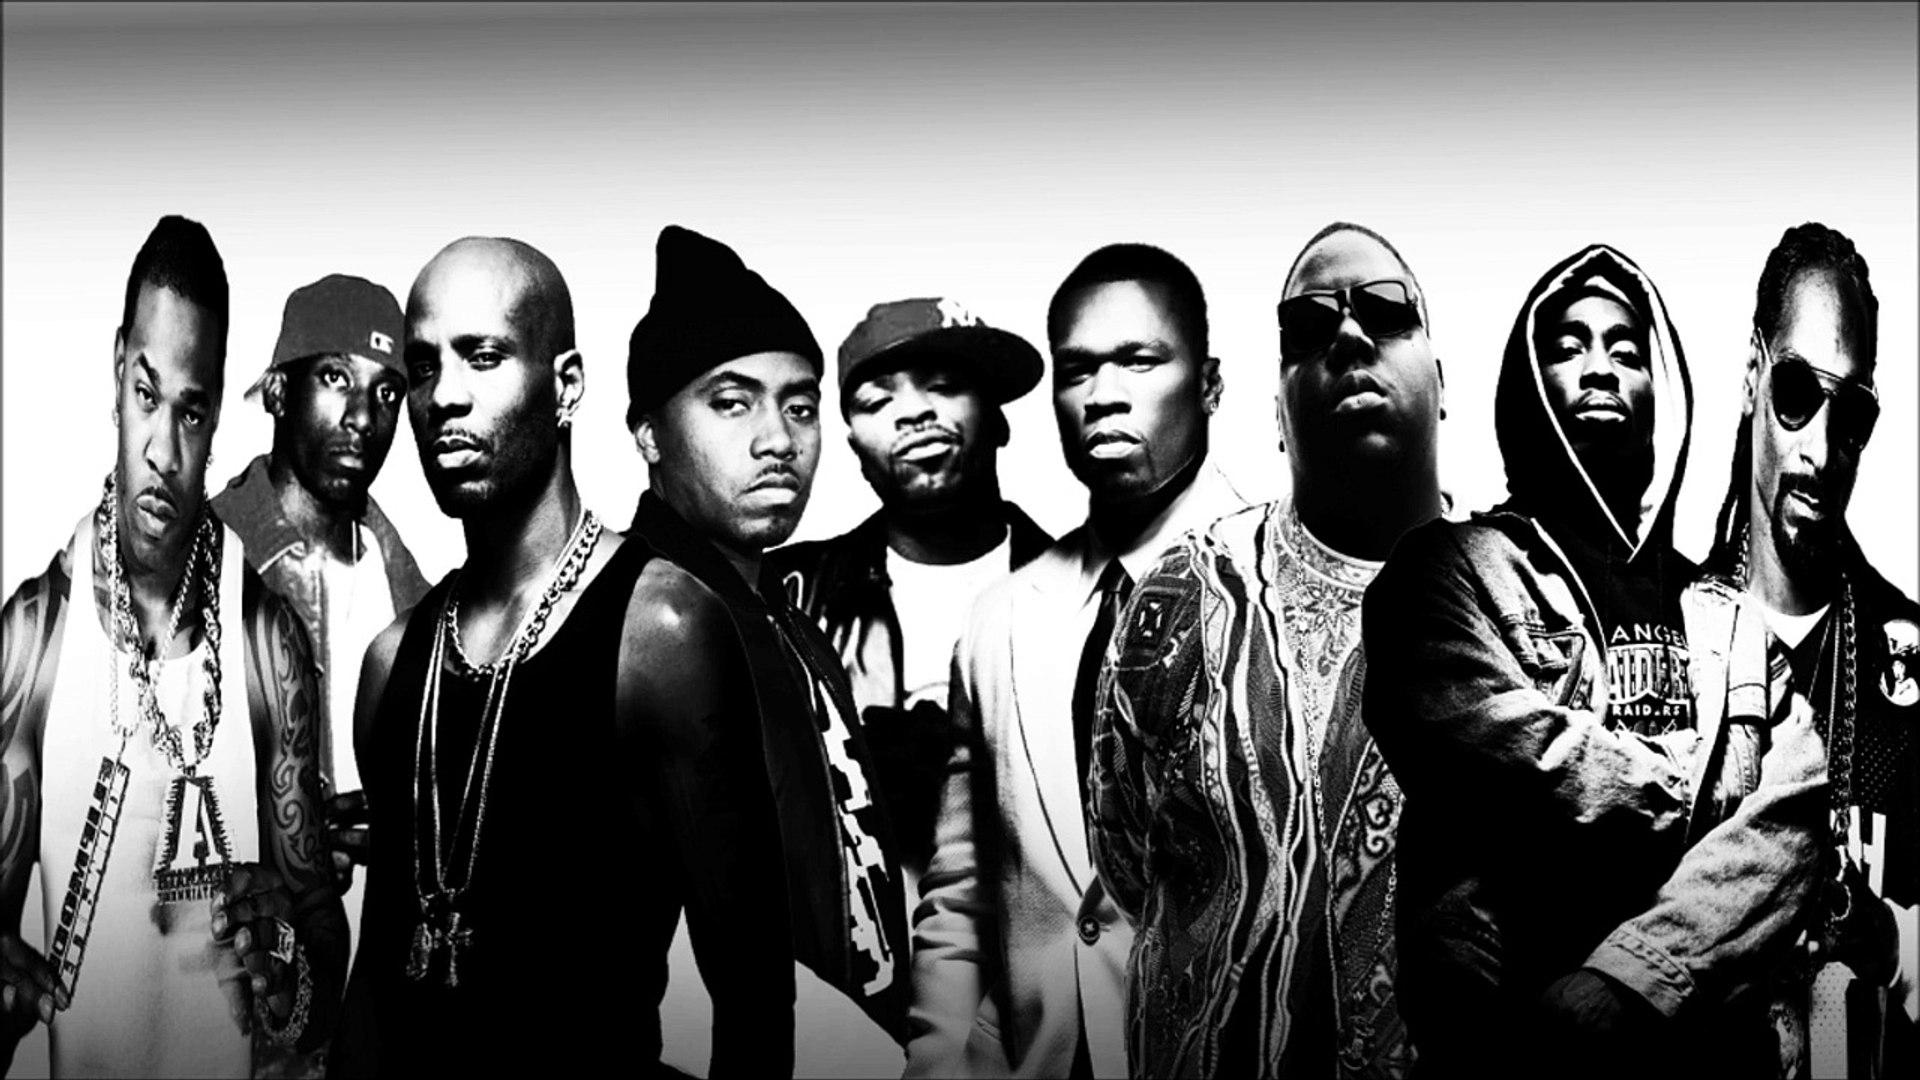 Da Rockwilder Ft. Busta Ryhmes, Big L, DMX, Nas, Method Man, 50 Cent, Biggie, Tupac ,Snoop Dogg